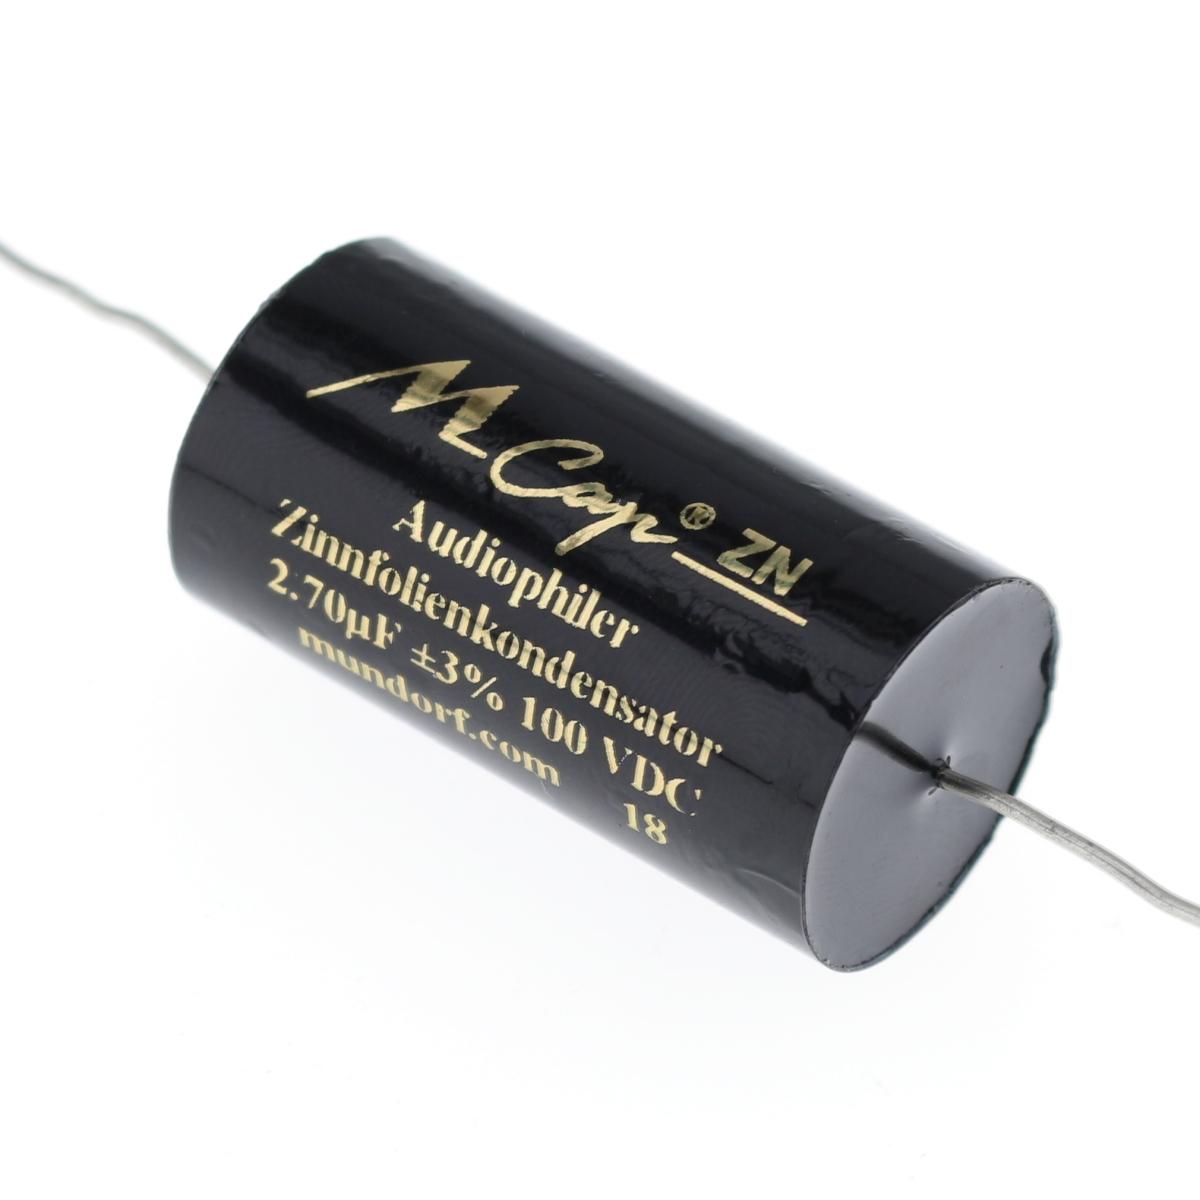 MUNDORF MCAP ZN Capacitor 630V 0.68μF